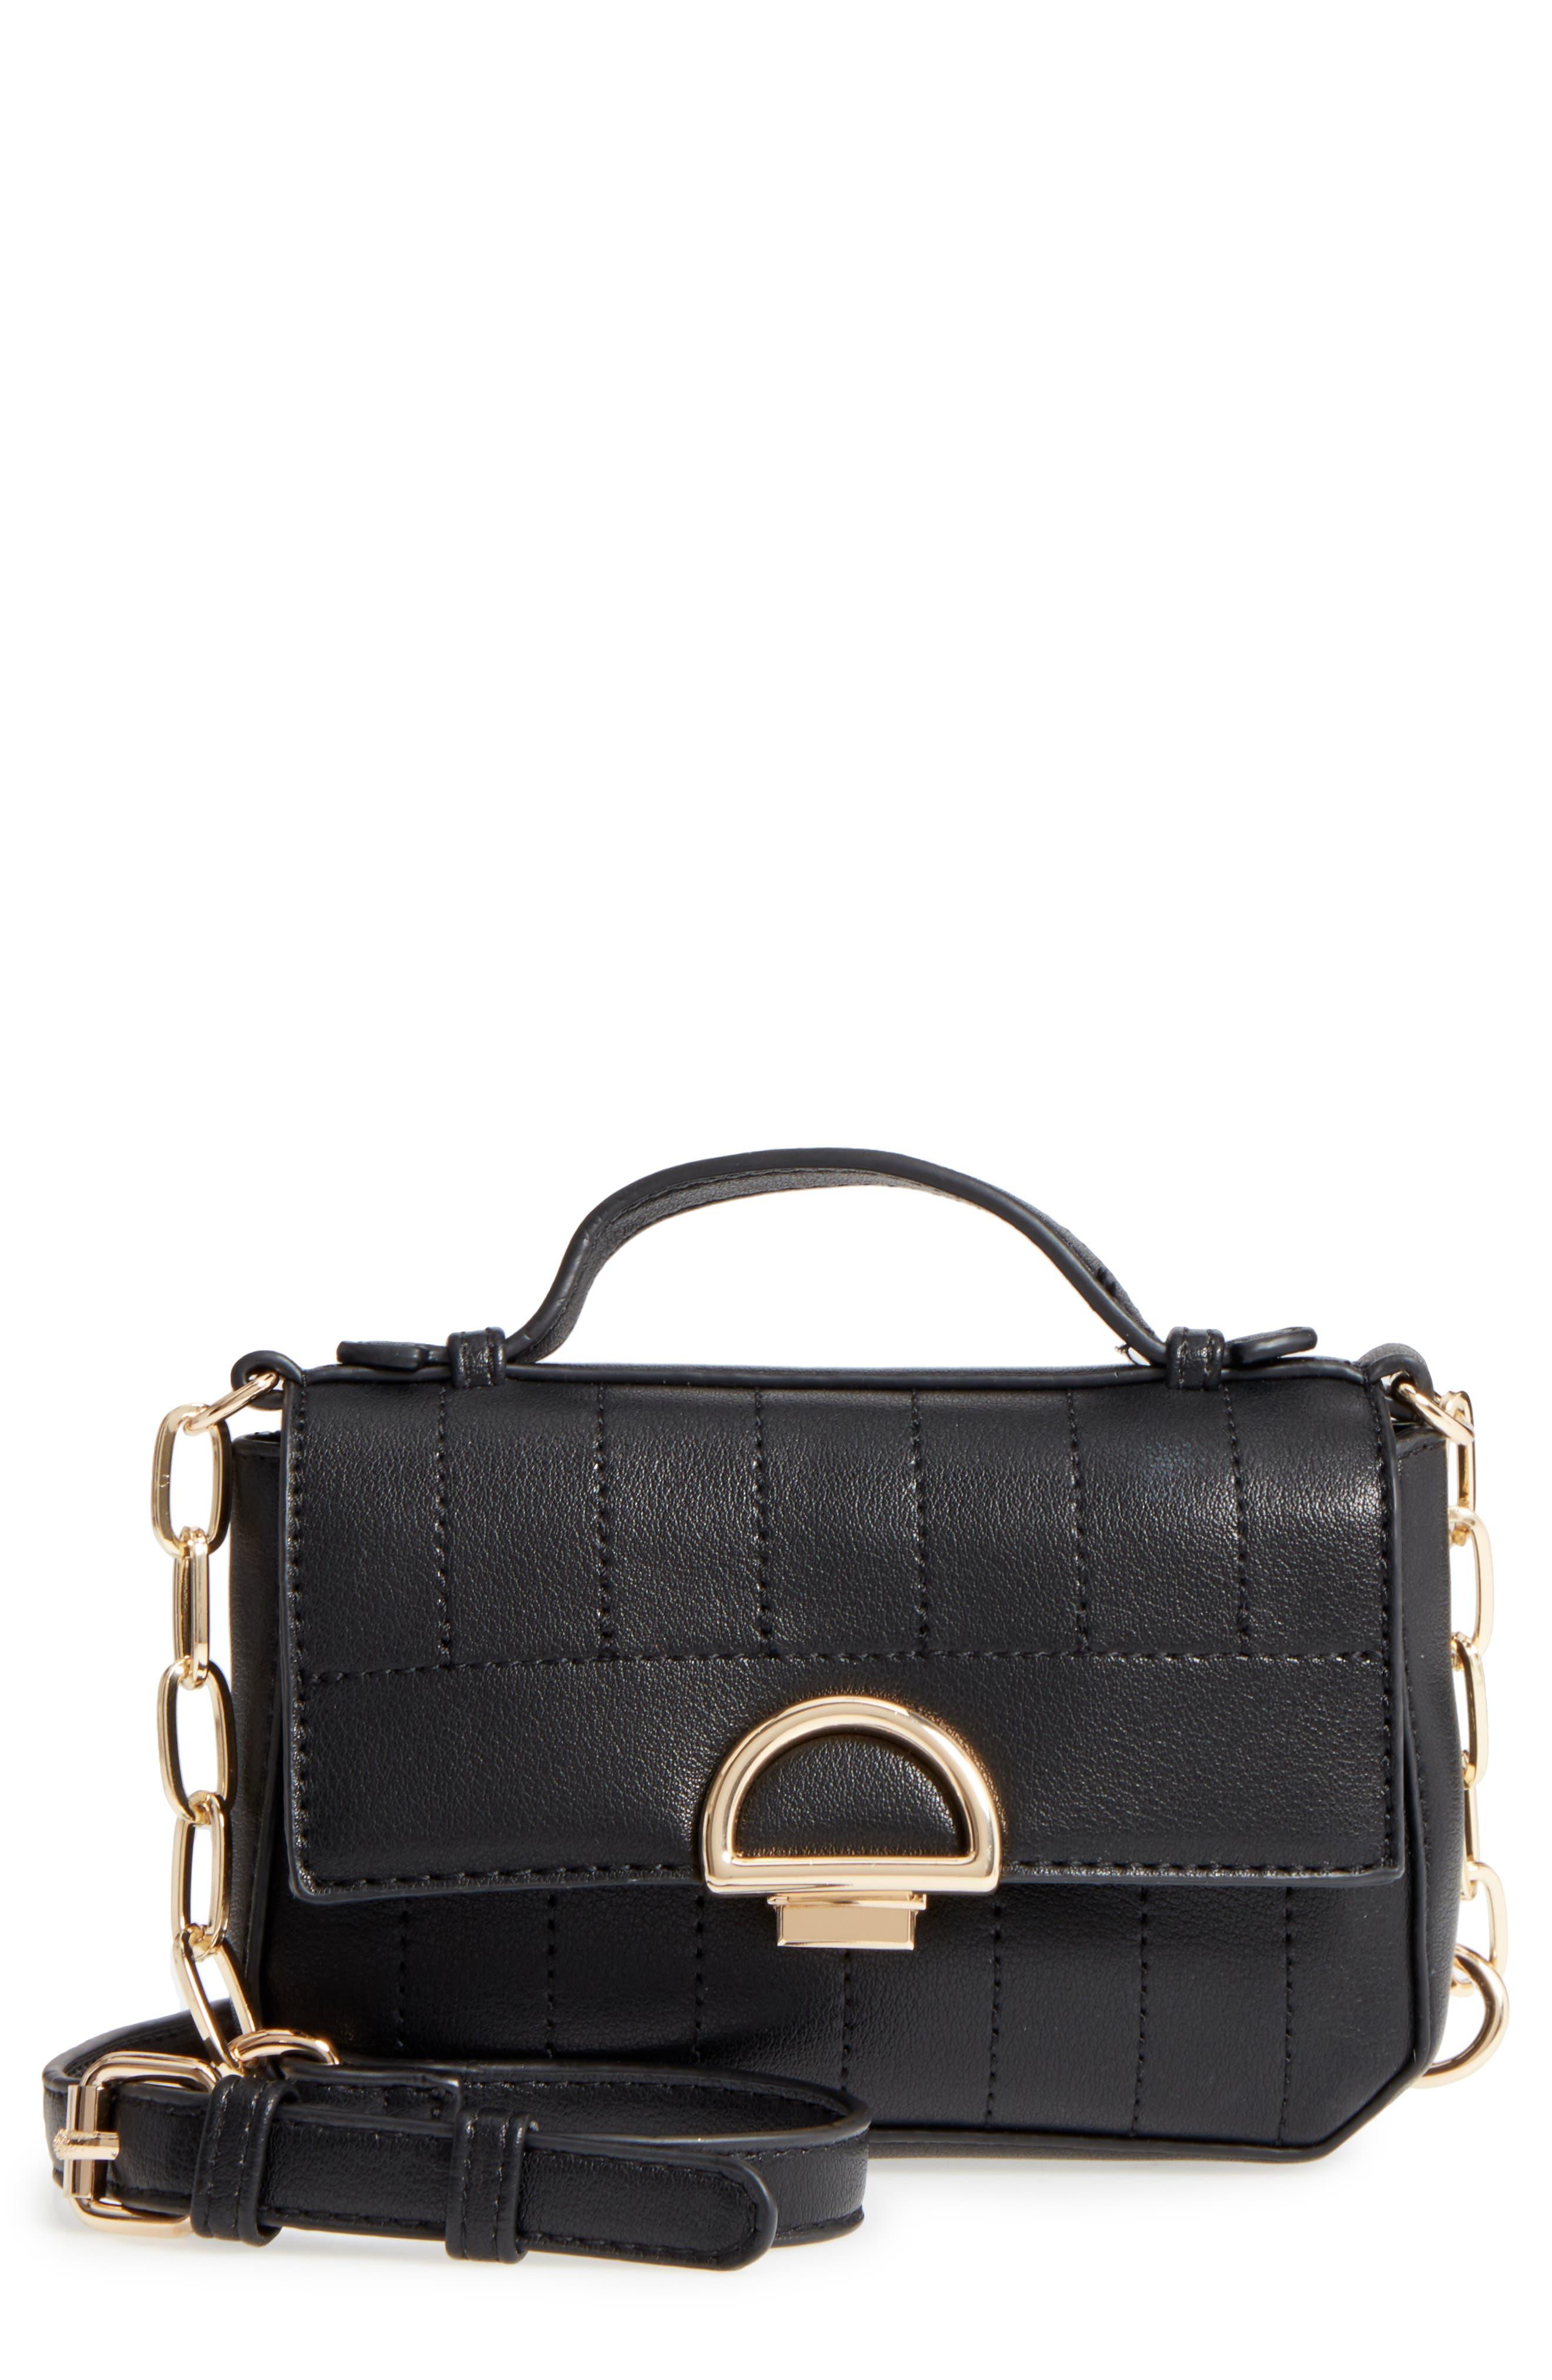 Kelsee Crossbody Bag,                         Main,                         color, Black